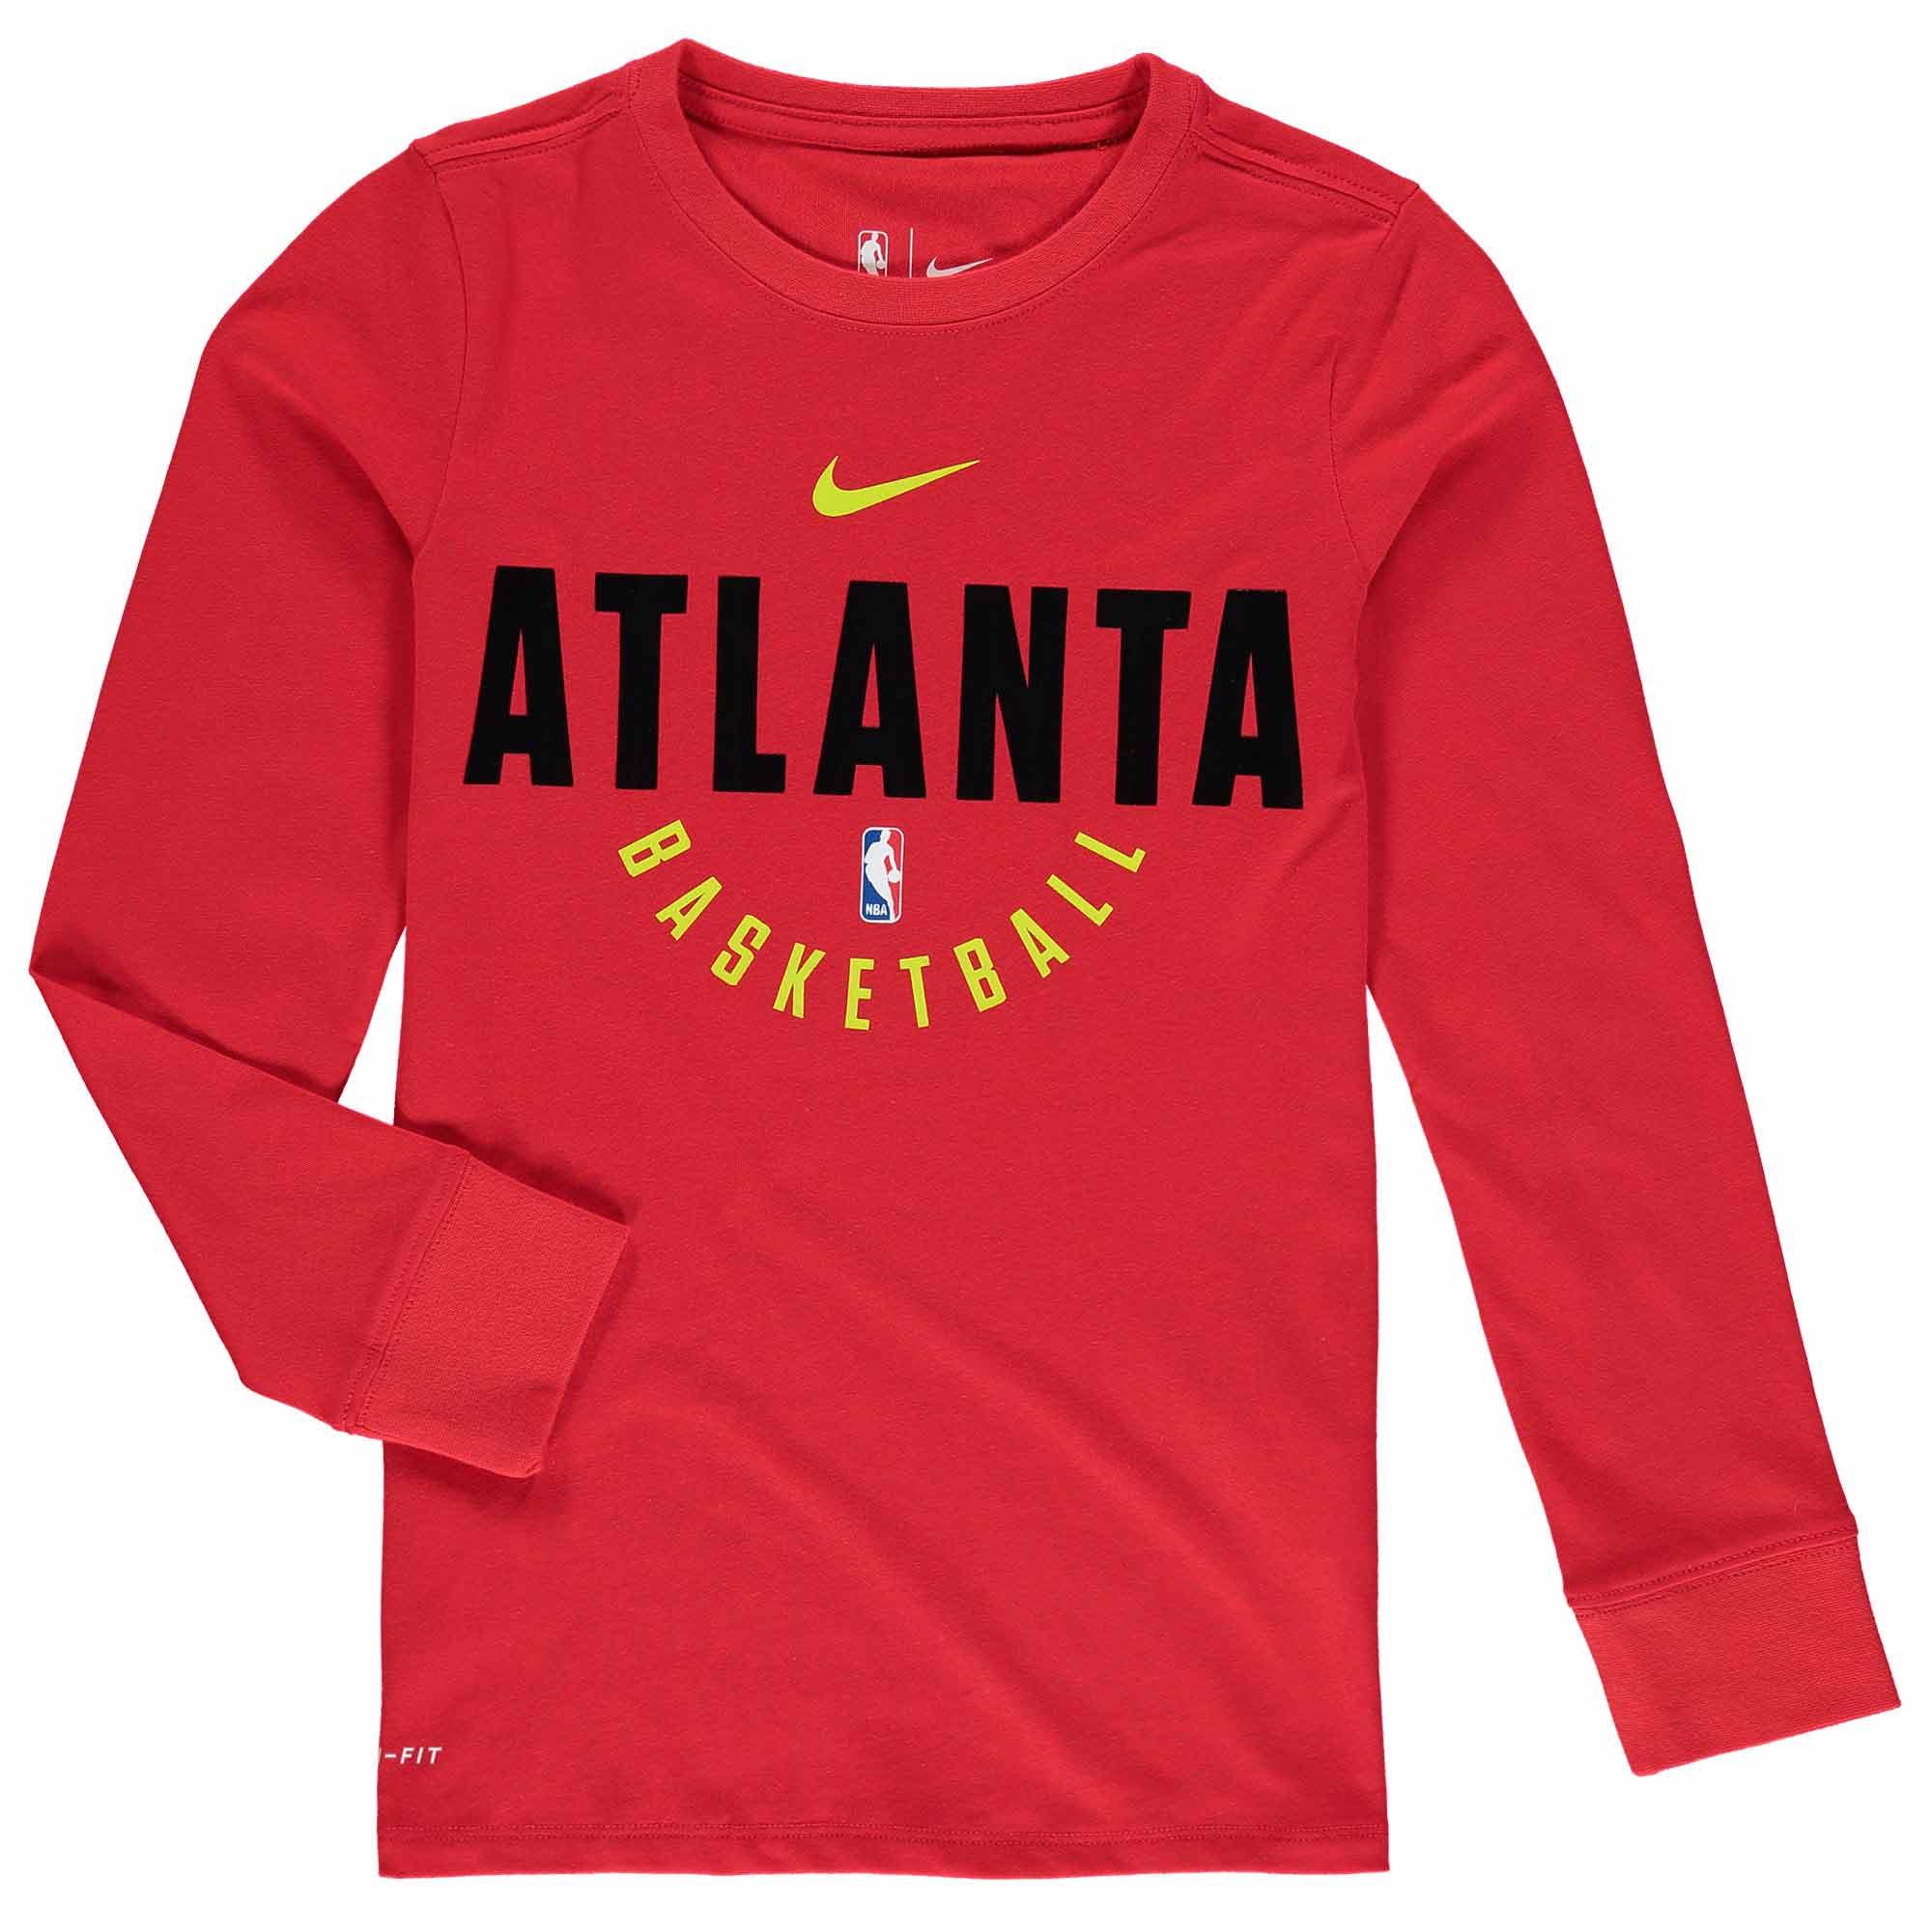 Atlanta Hawks Nike Youth Elite Performance Practice Long Sleeve T-Shirt - Red